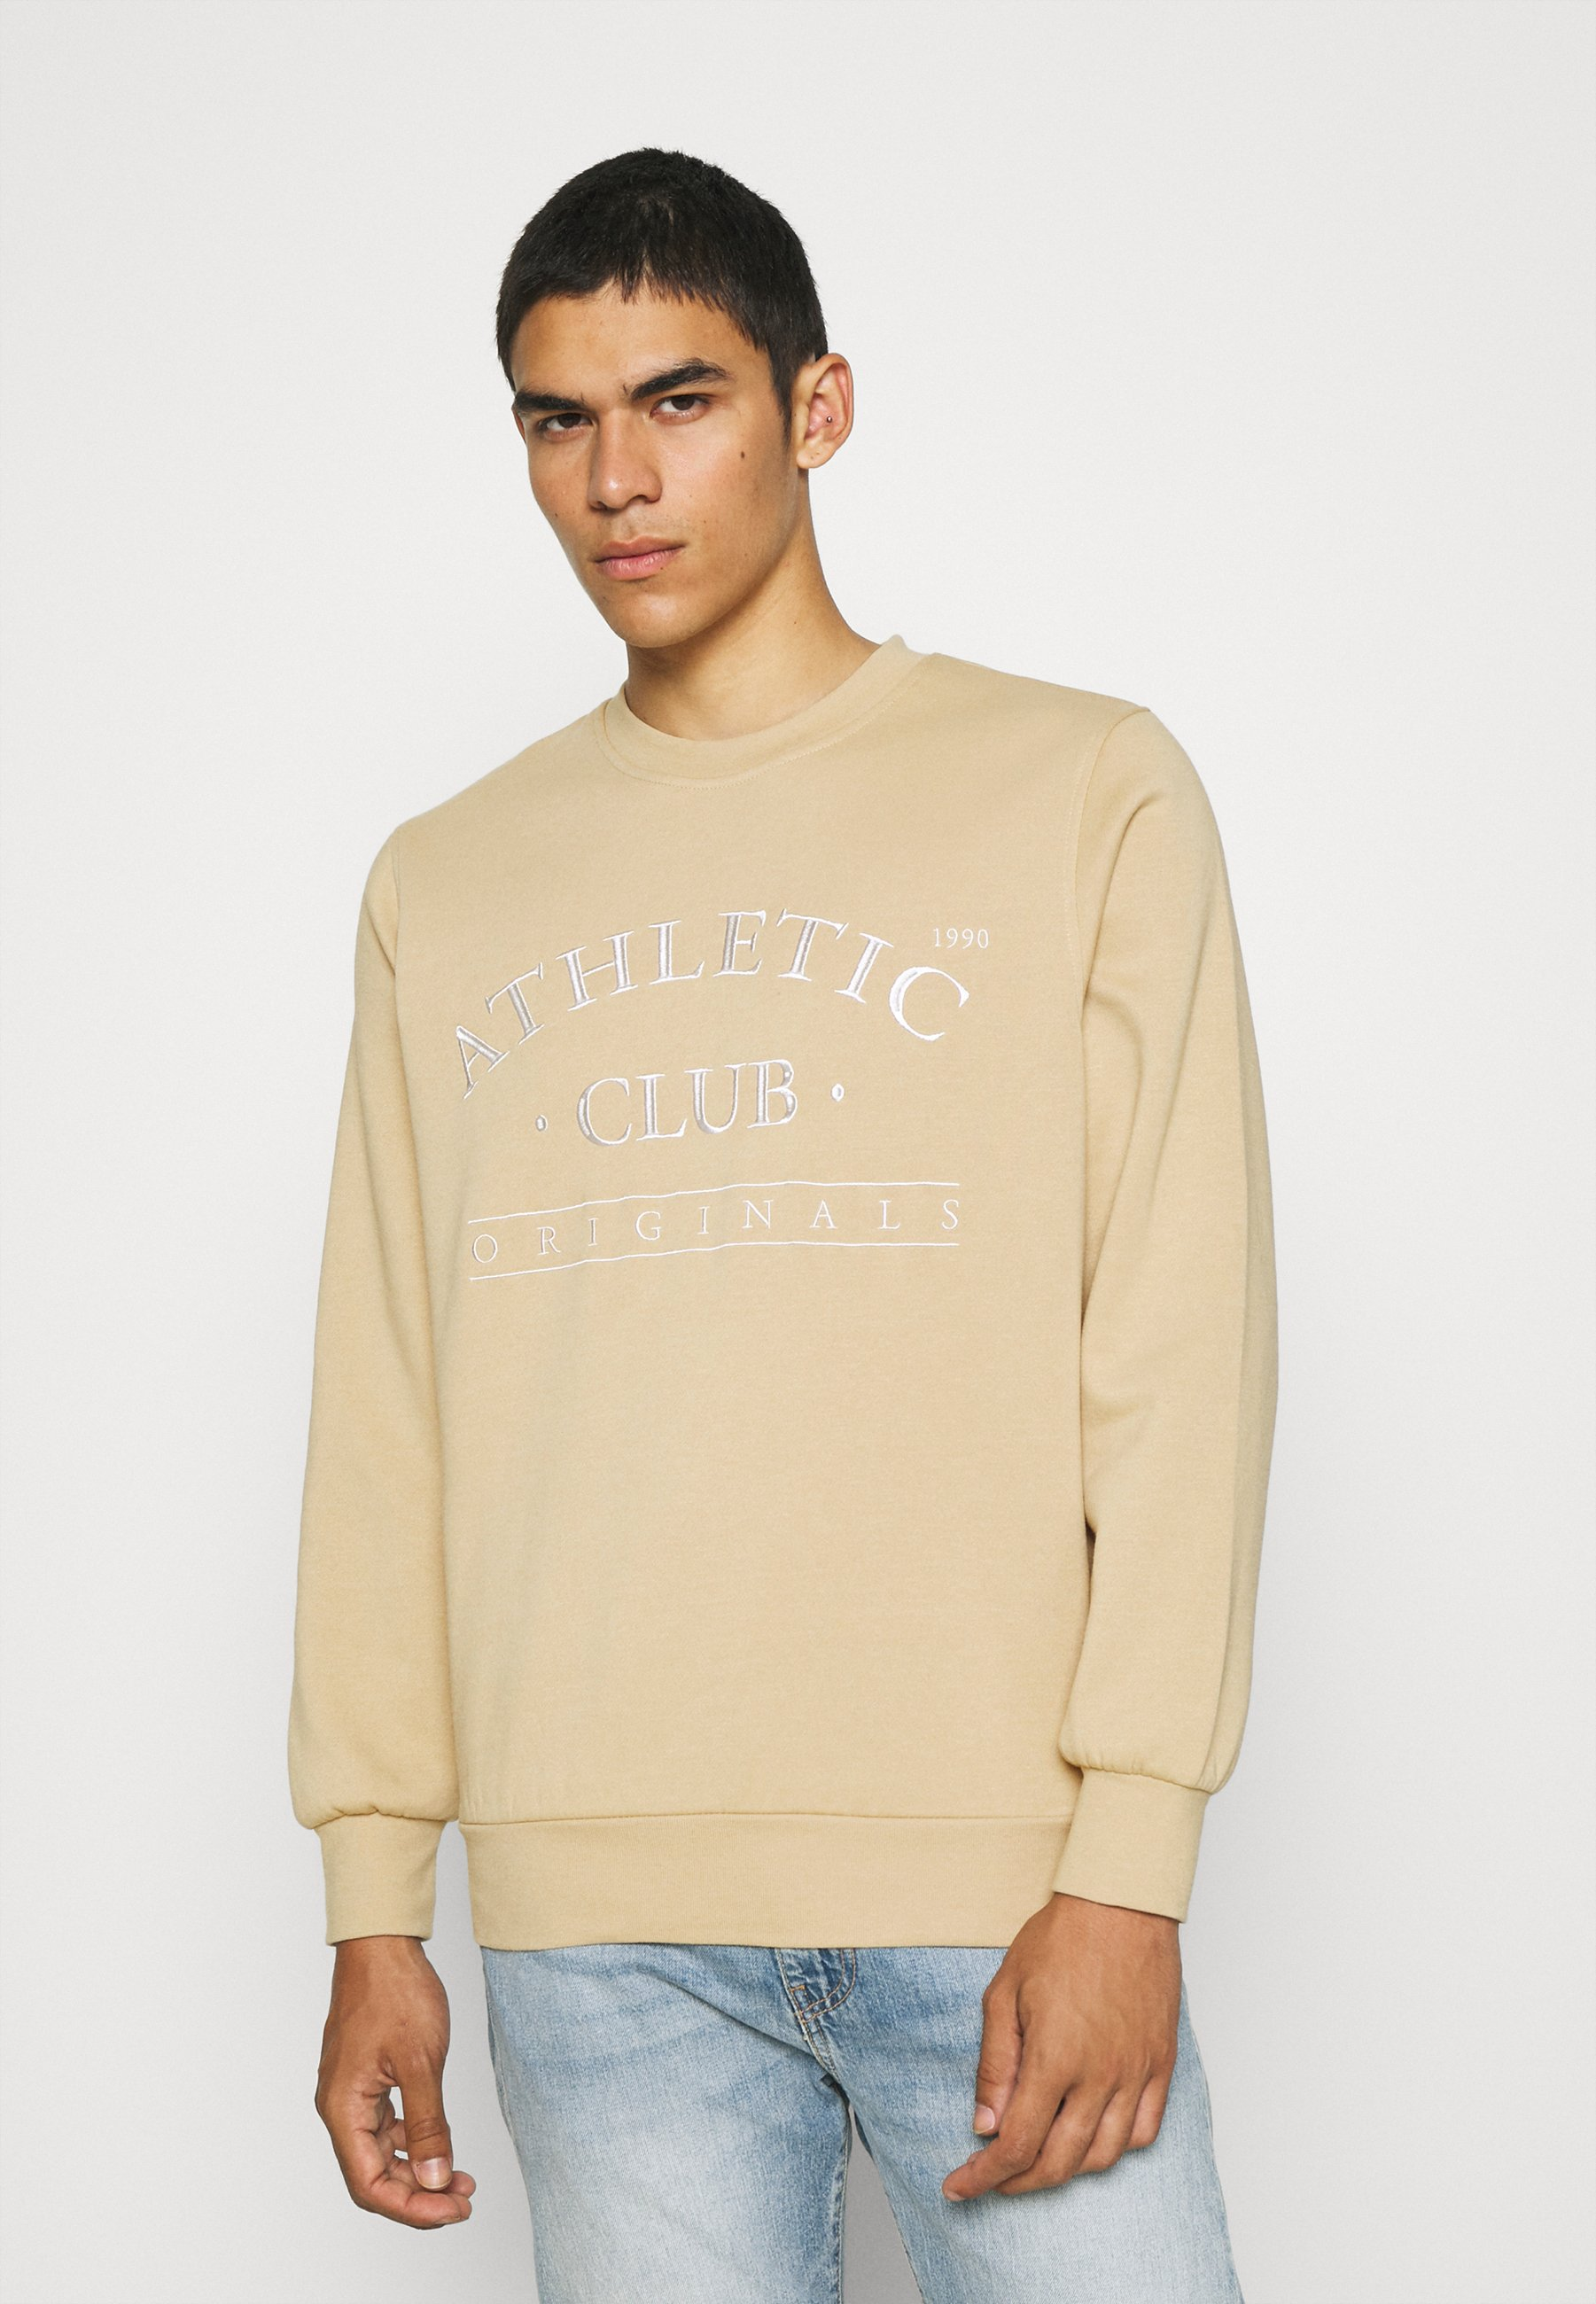 Homme JORTOBIAS CREW NECK UNISEX - Sweatshirt